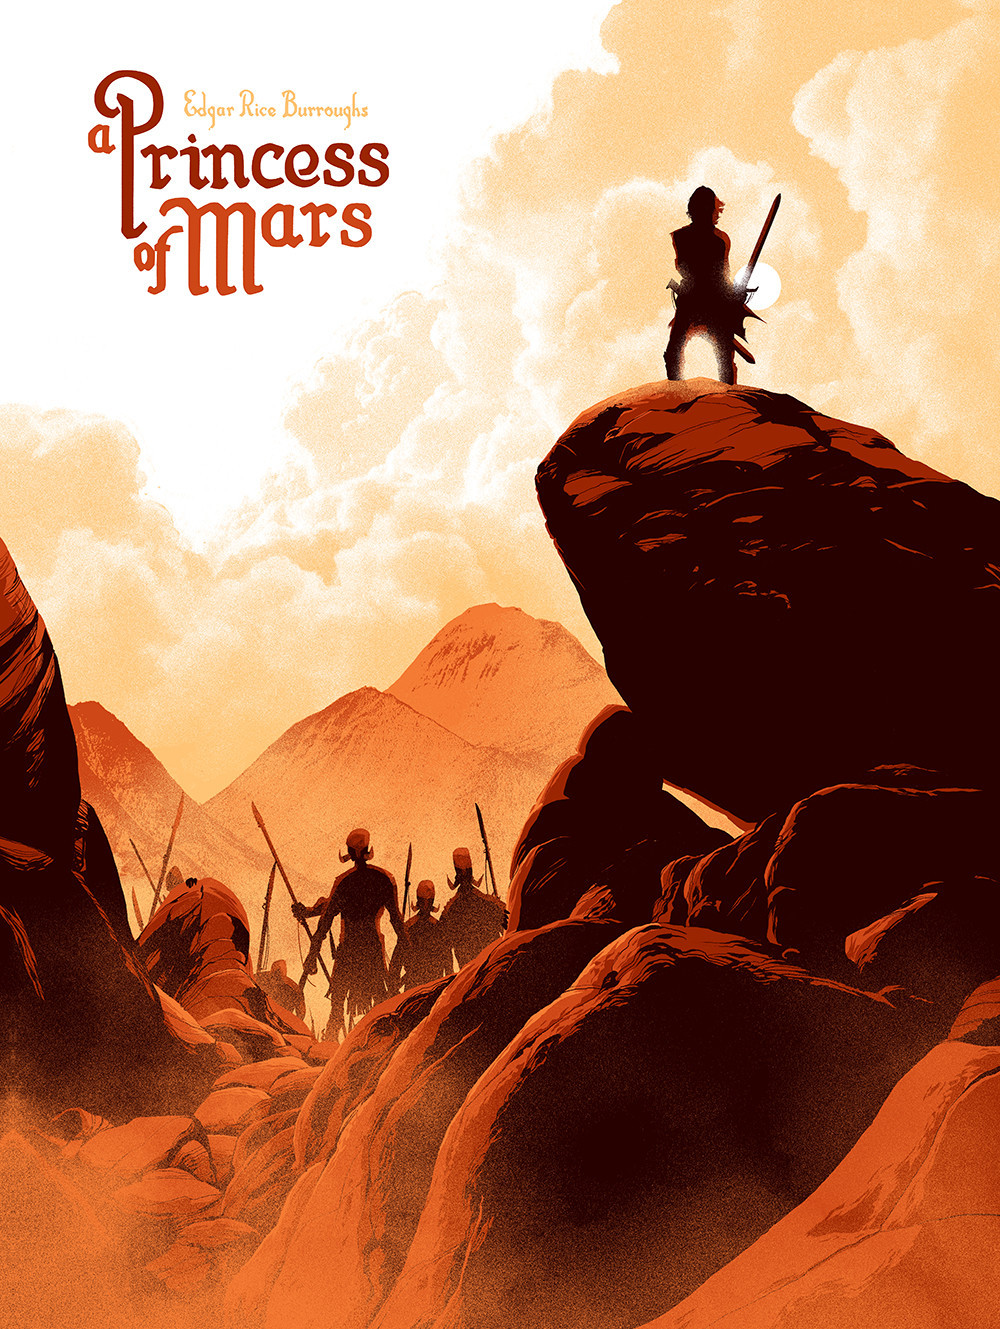 'A Princess of Mars' by Matt Taylor for Black Dragon Press